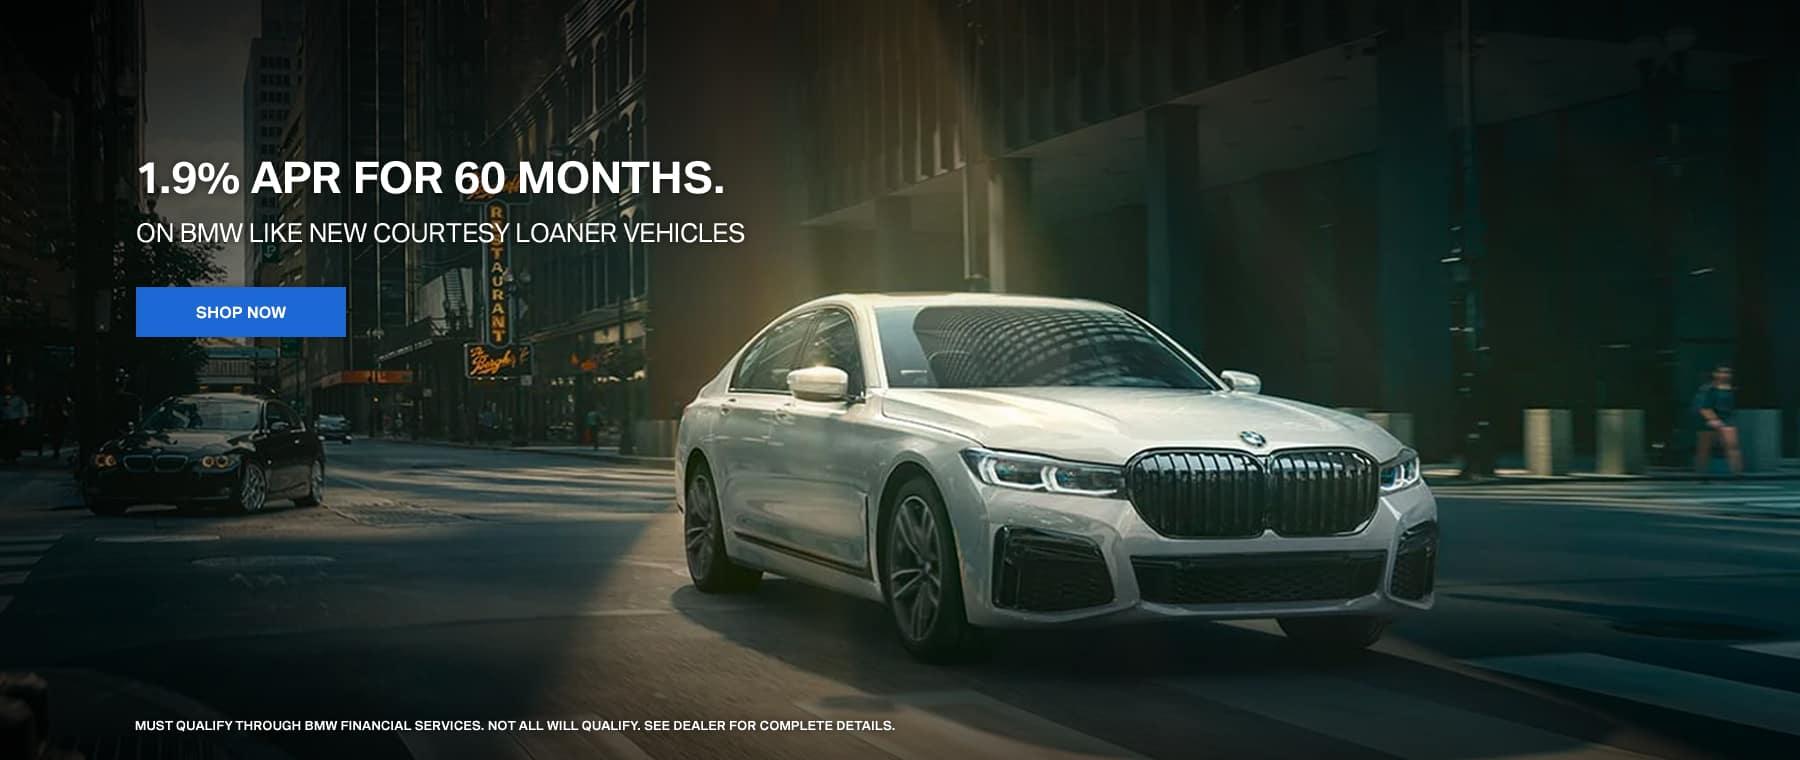 Courtesy Vehicle Offer